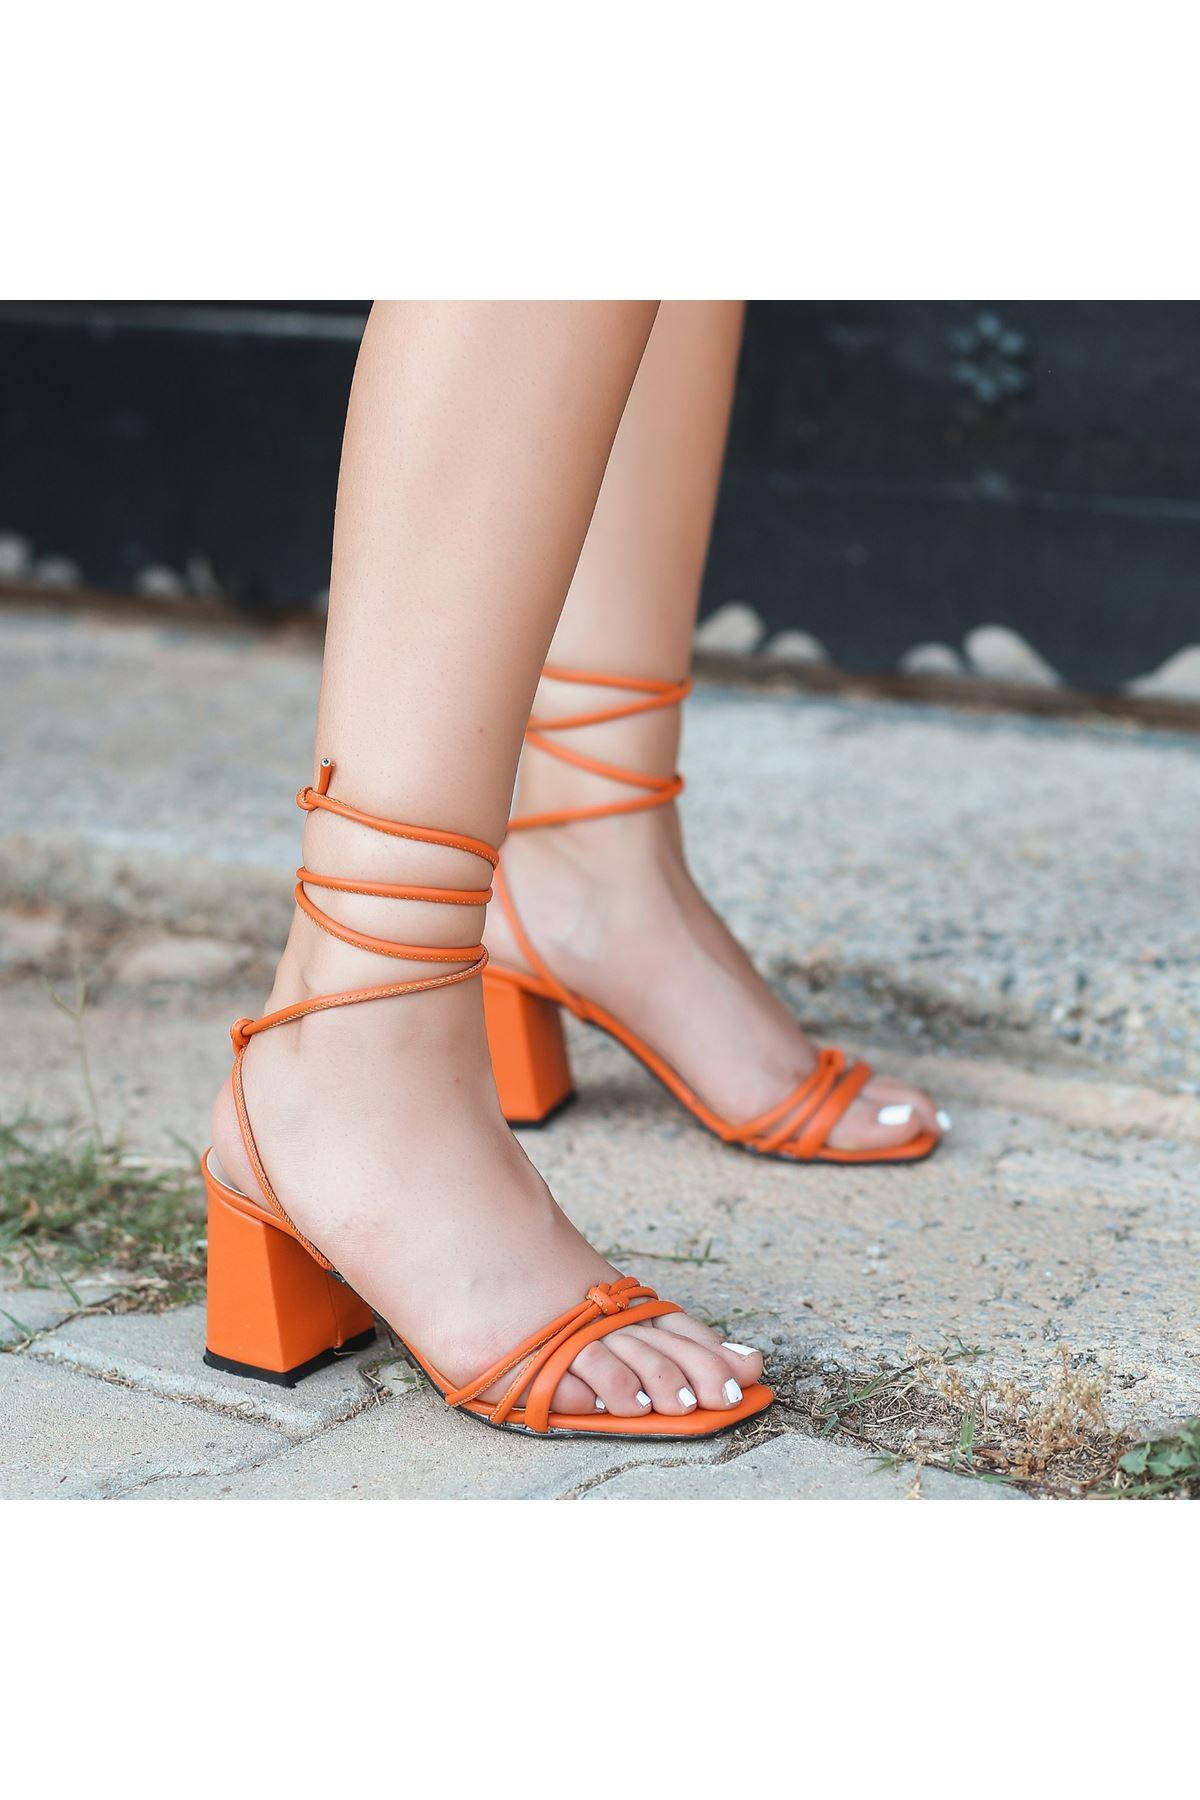 Jost Turuncu Cilt Topuklu Ayakkabı